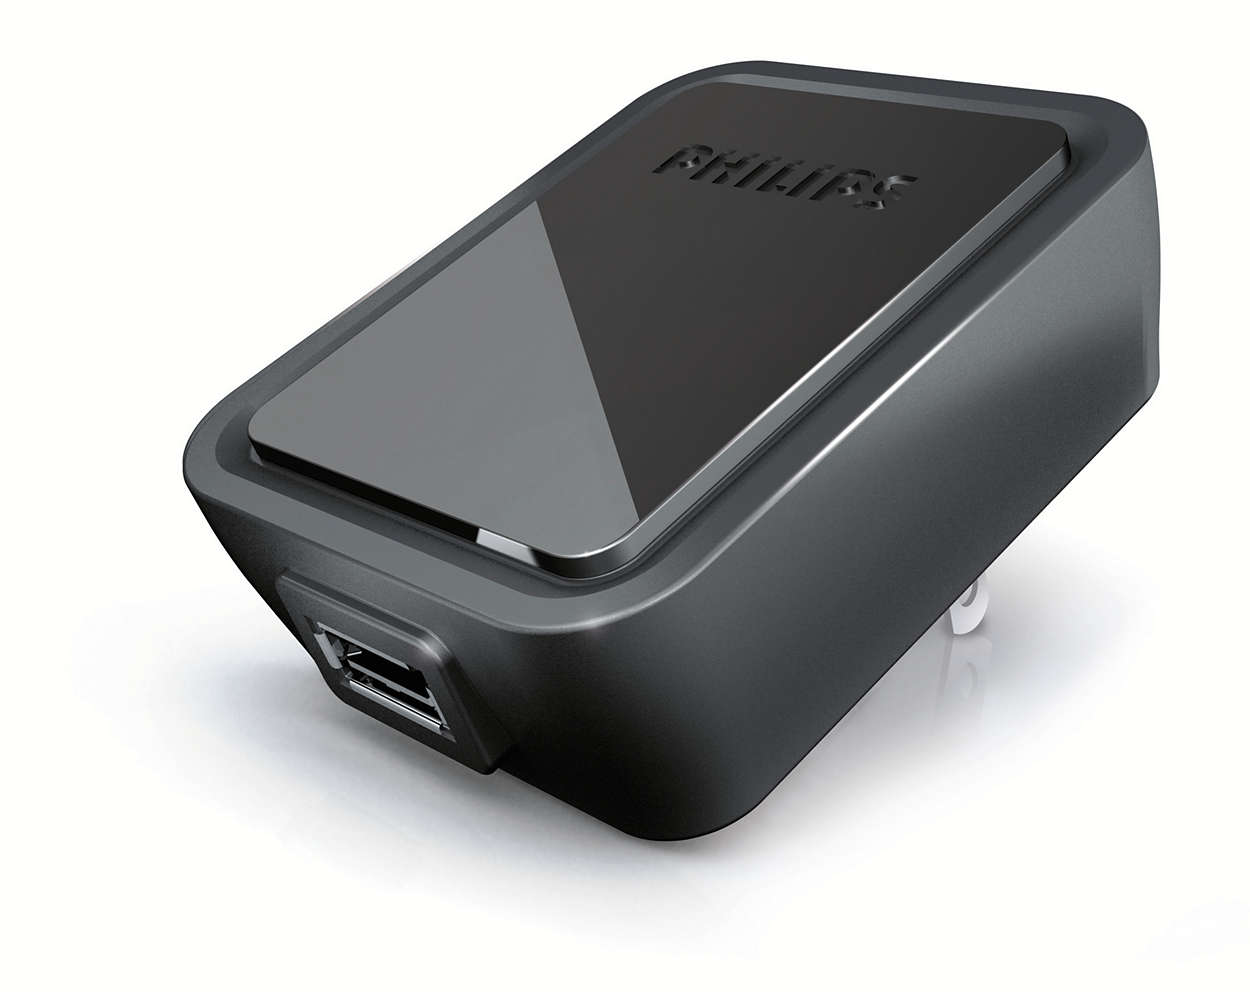 Universal USB charger